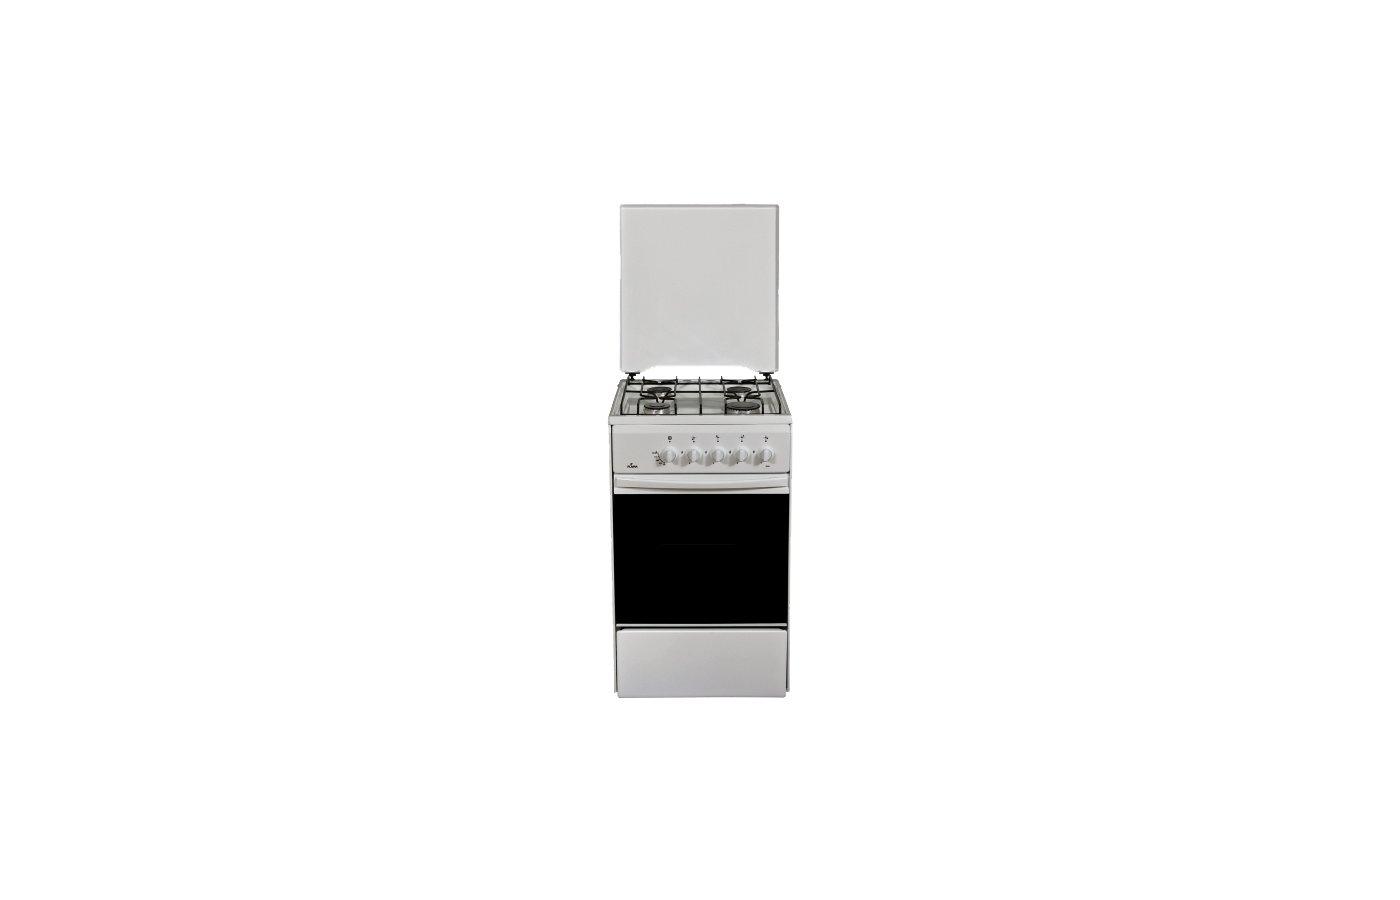 Плита газовая FLAMA RG 2401 W RG2401W